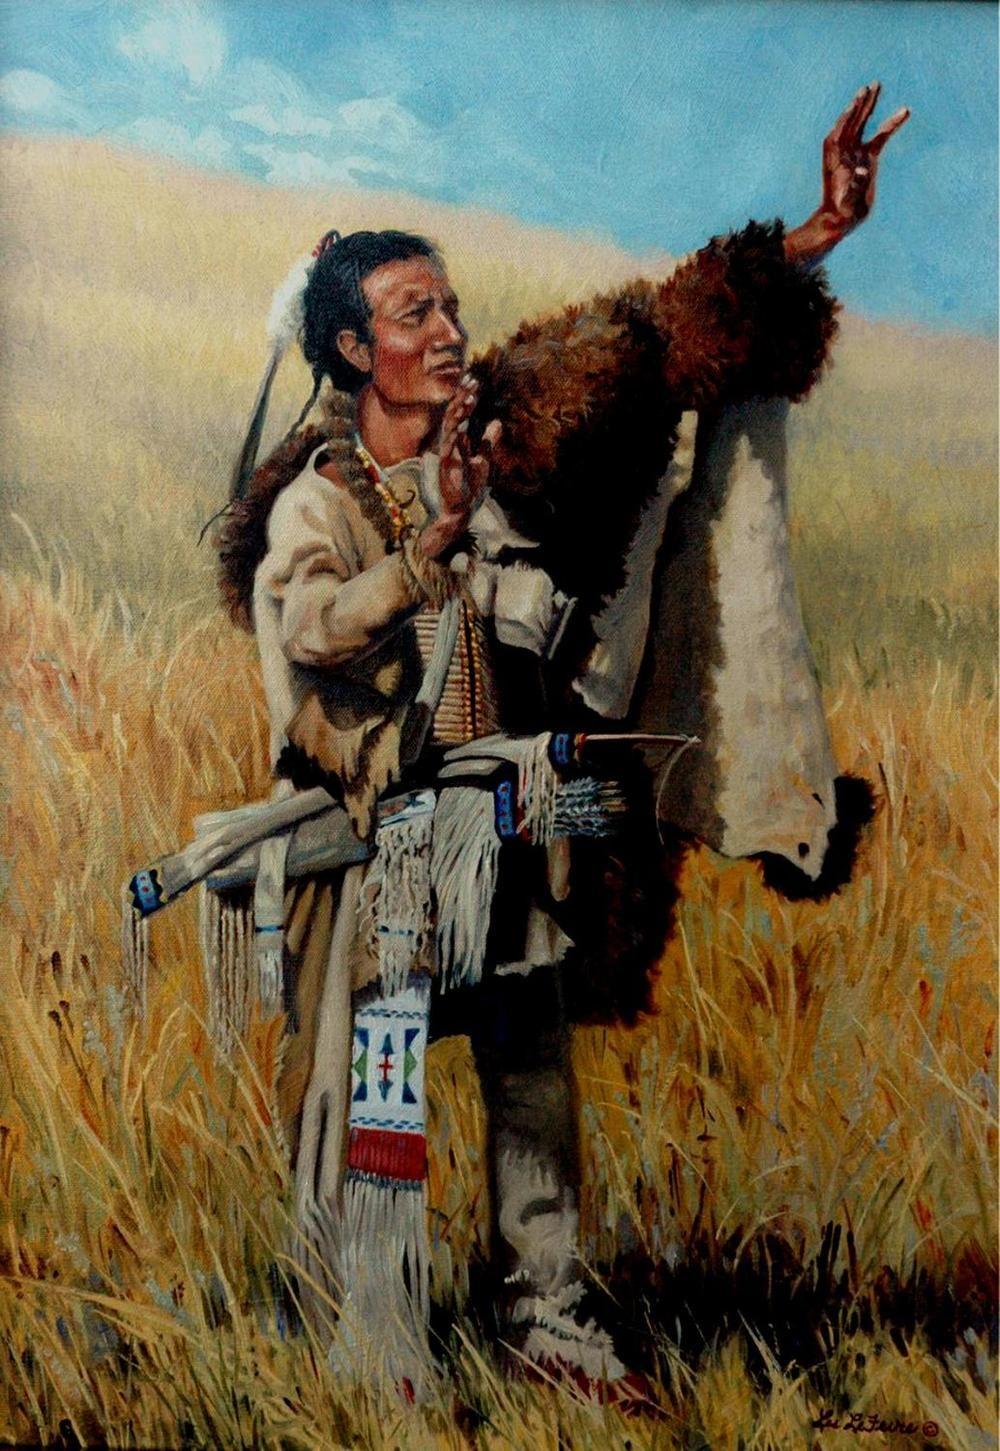 Pin on Native American Artwork